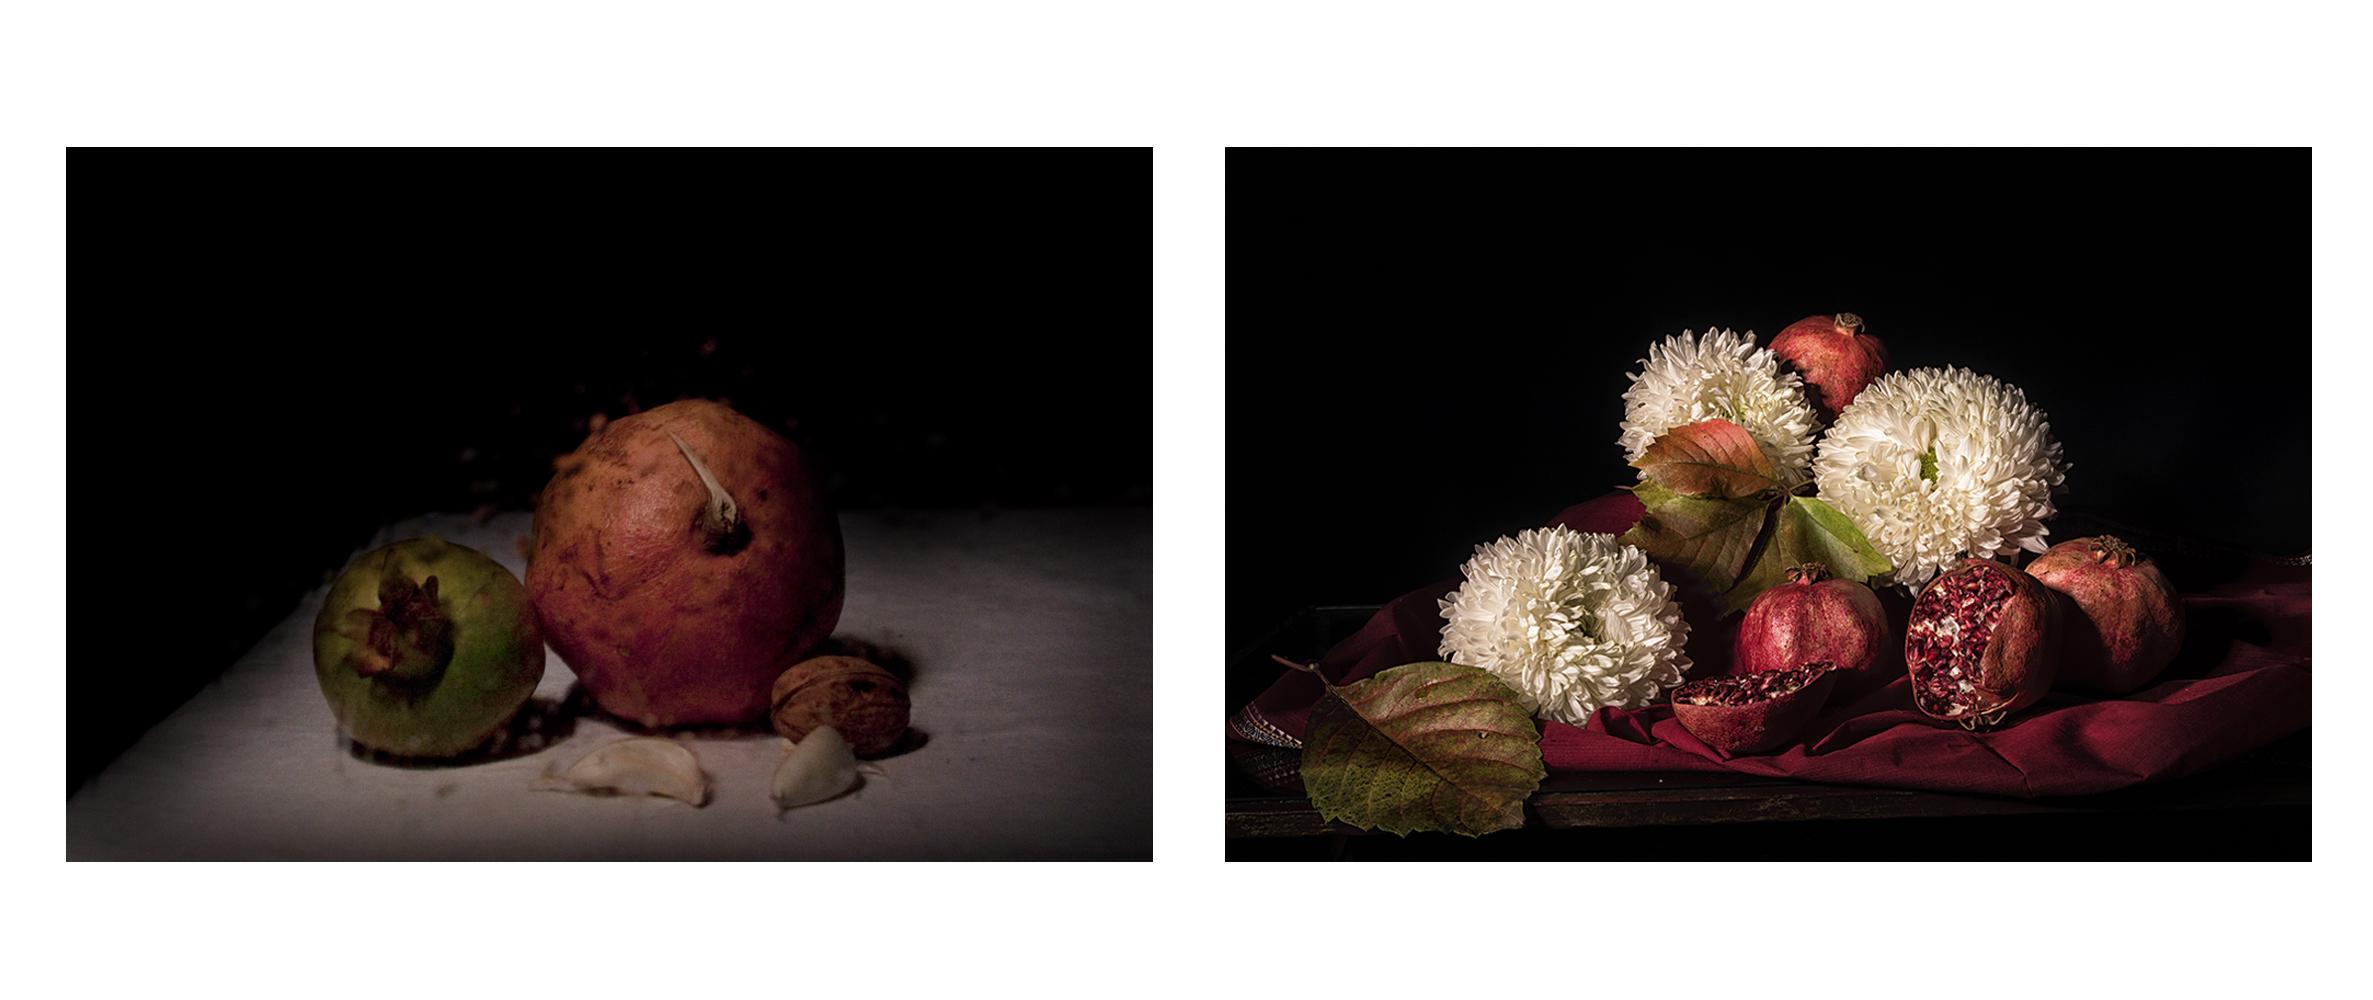 The 2017 Photographic Conversations Exhibition